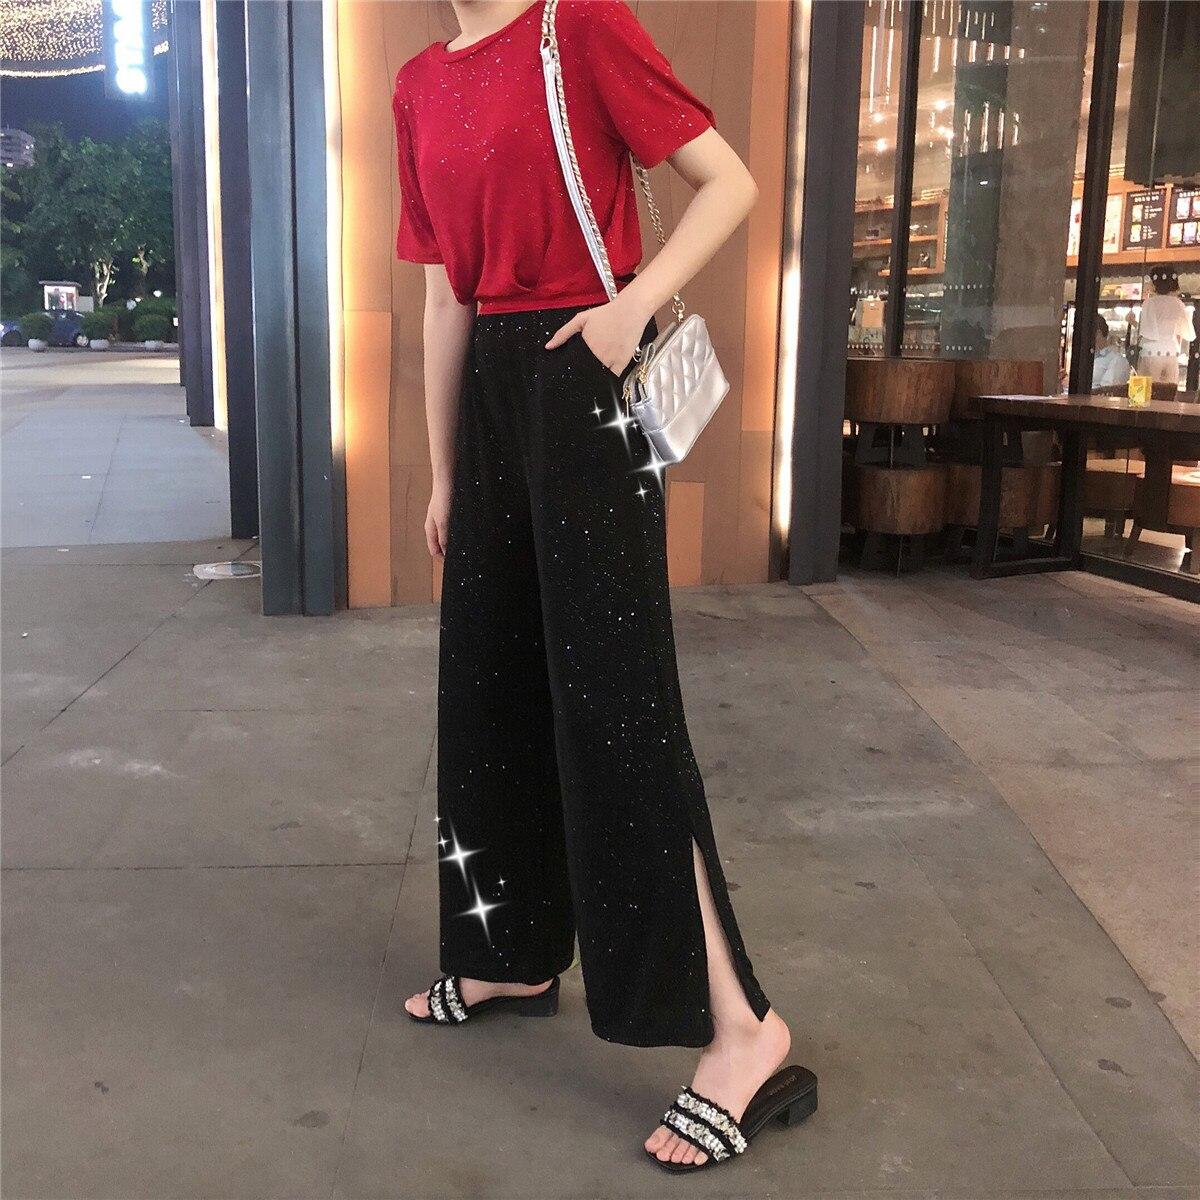 1188 # [Photo Shoot] Korean-style Crew Neck Pullover Navel Black Paillette Short Sleeve T-shirt Women's Loose Pants Leisure Suit